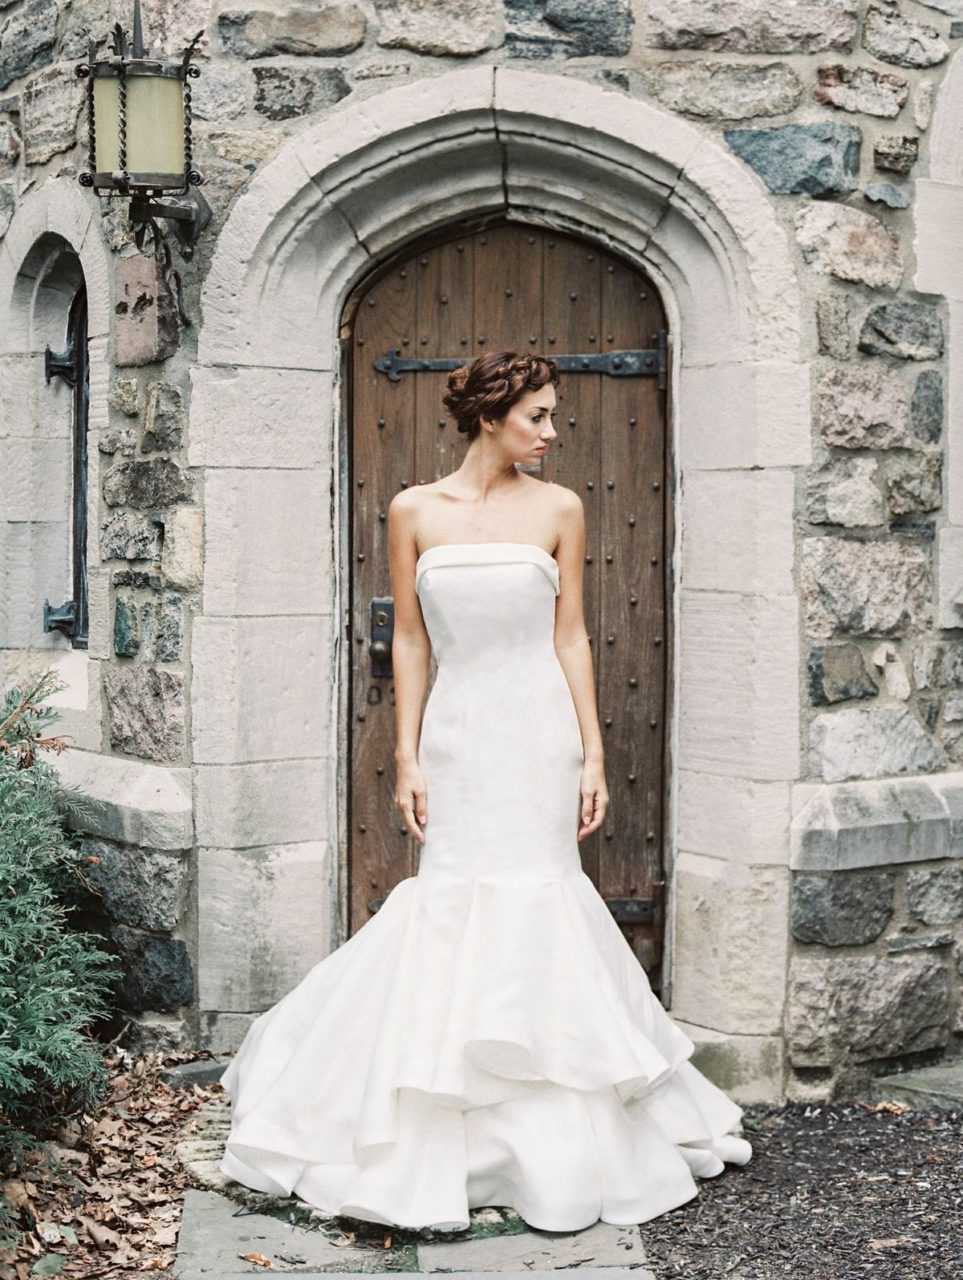 sareh_nouri_mermaid_wedding_dress_2015